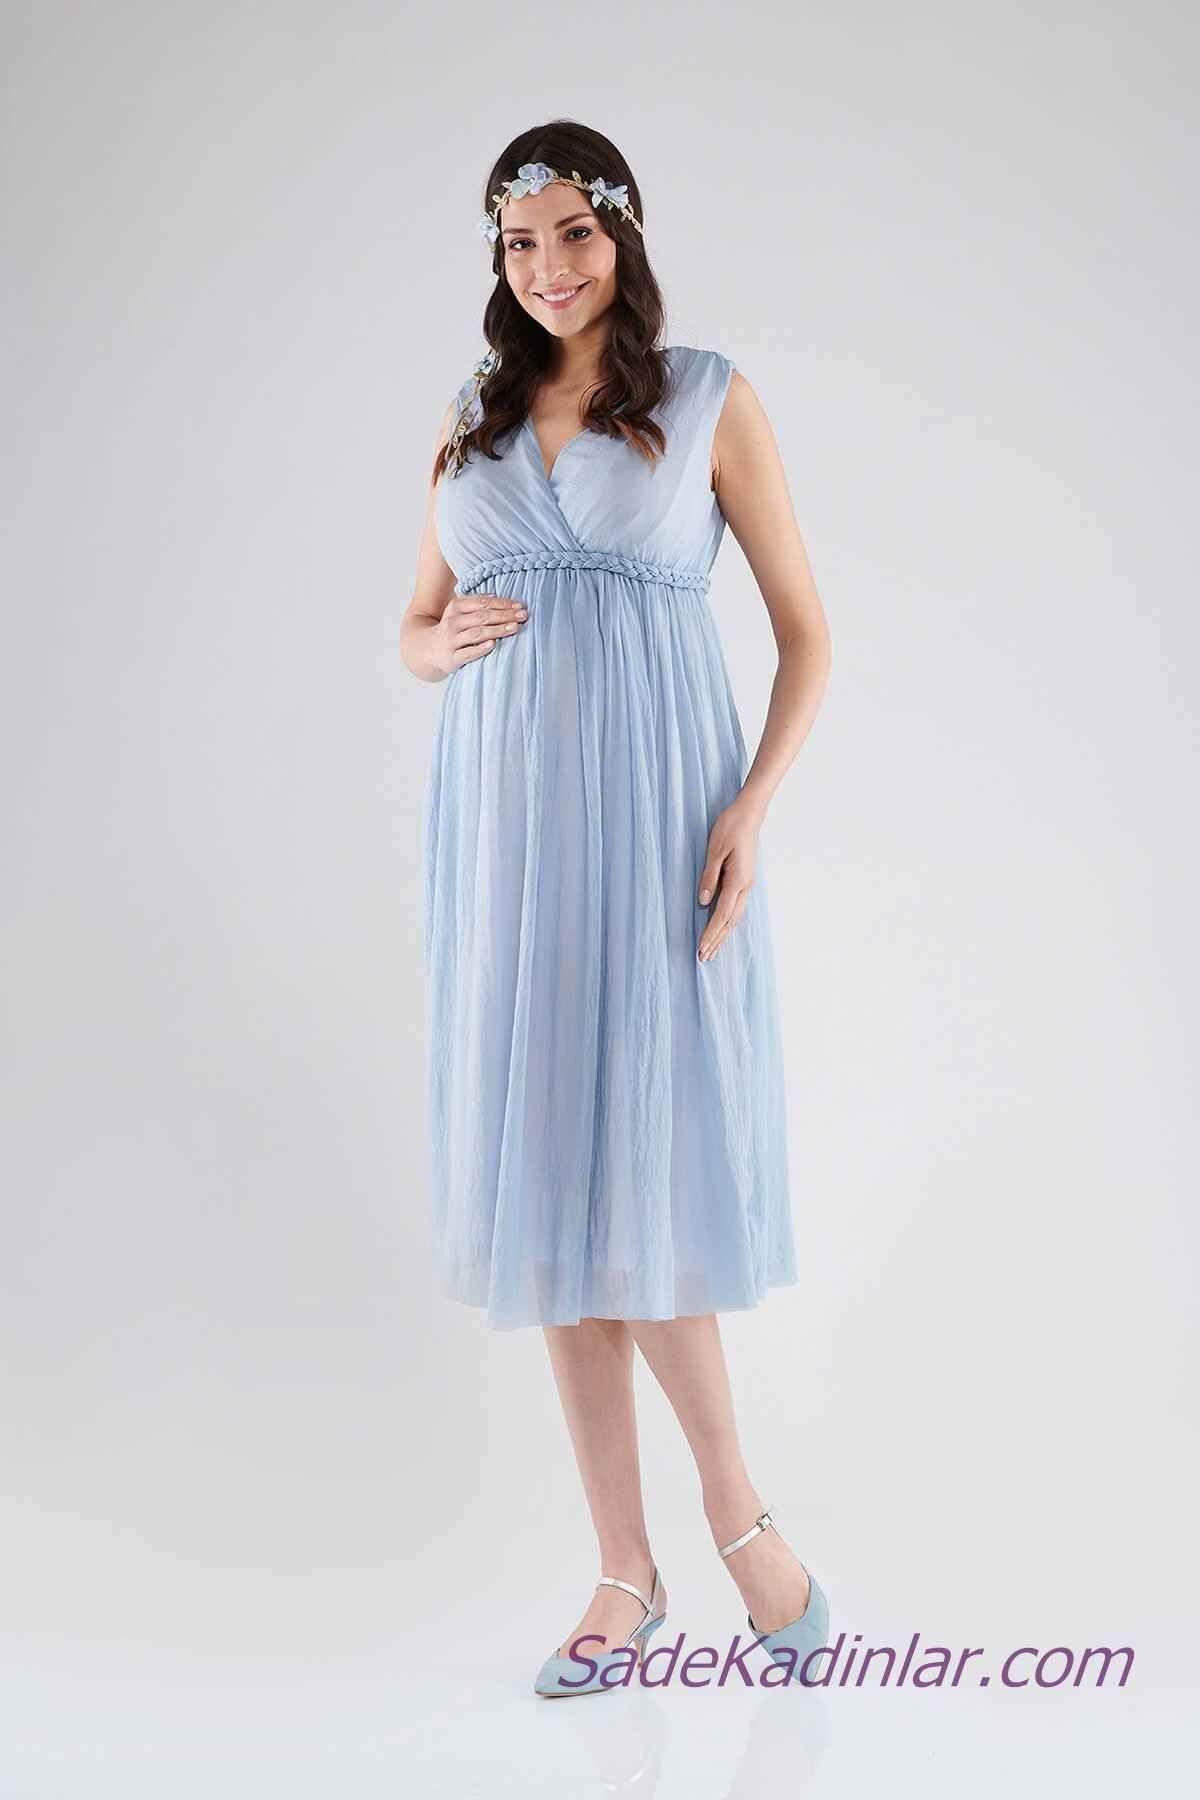 Hamile Abiye Elbise Modelleri Bebek Mavisi Midi V Yakali Kolsuz Orgu Kemer Detayli Elbise Modelleri Elbise Moda Stilleri